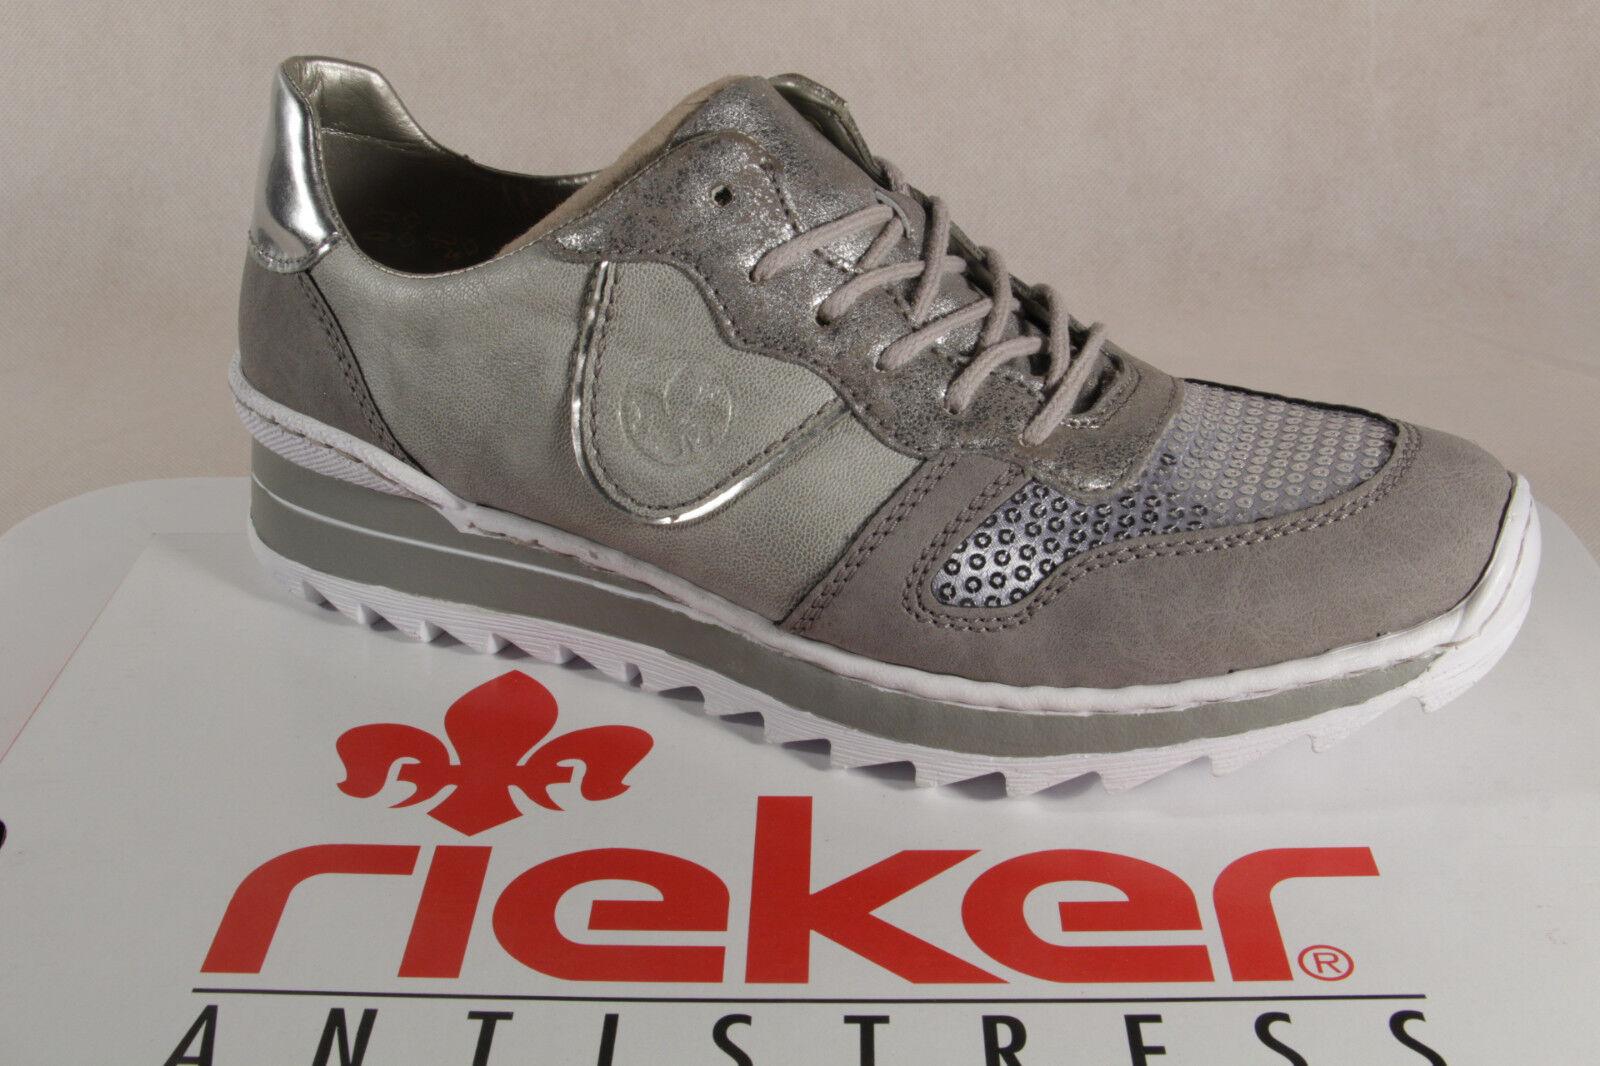 Rieker Damen Schnürschuh, Halbschuh, Sneaker, grau, M6902 NEU!